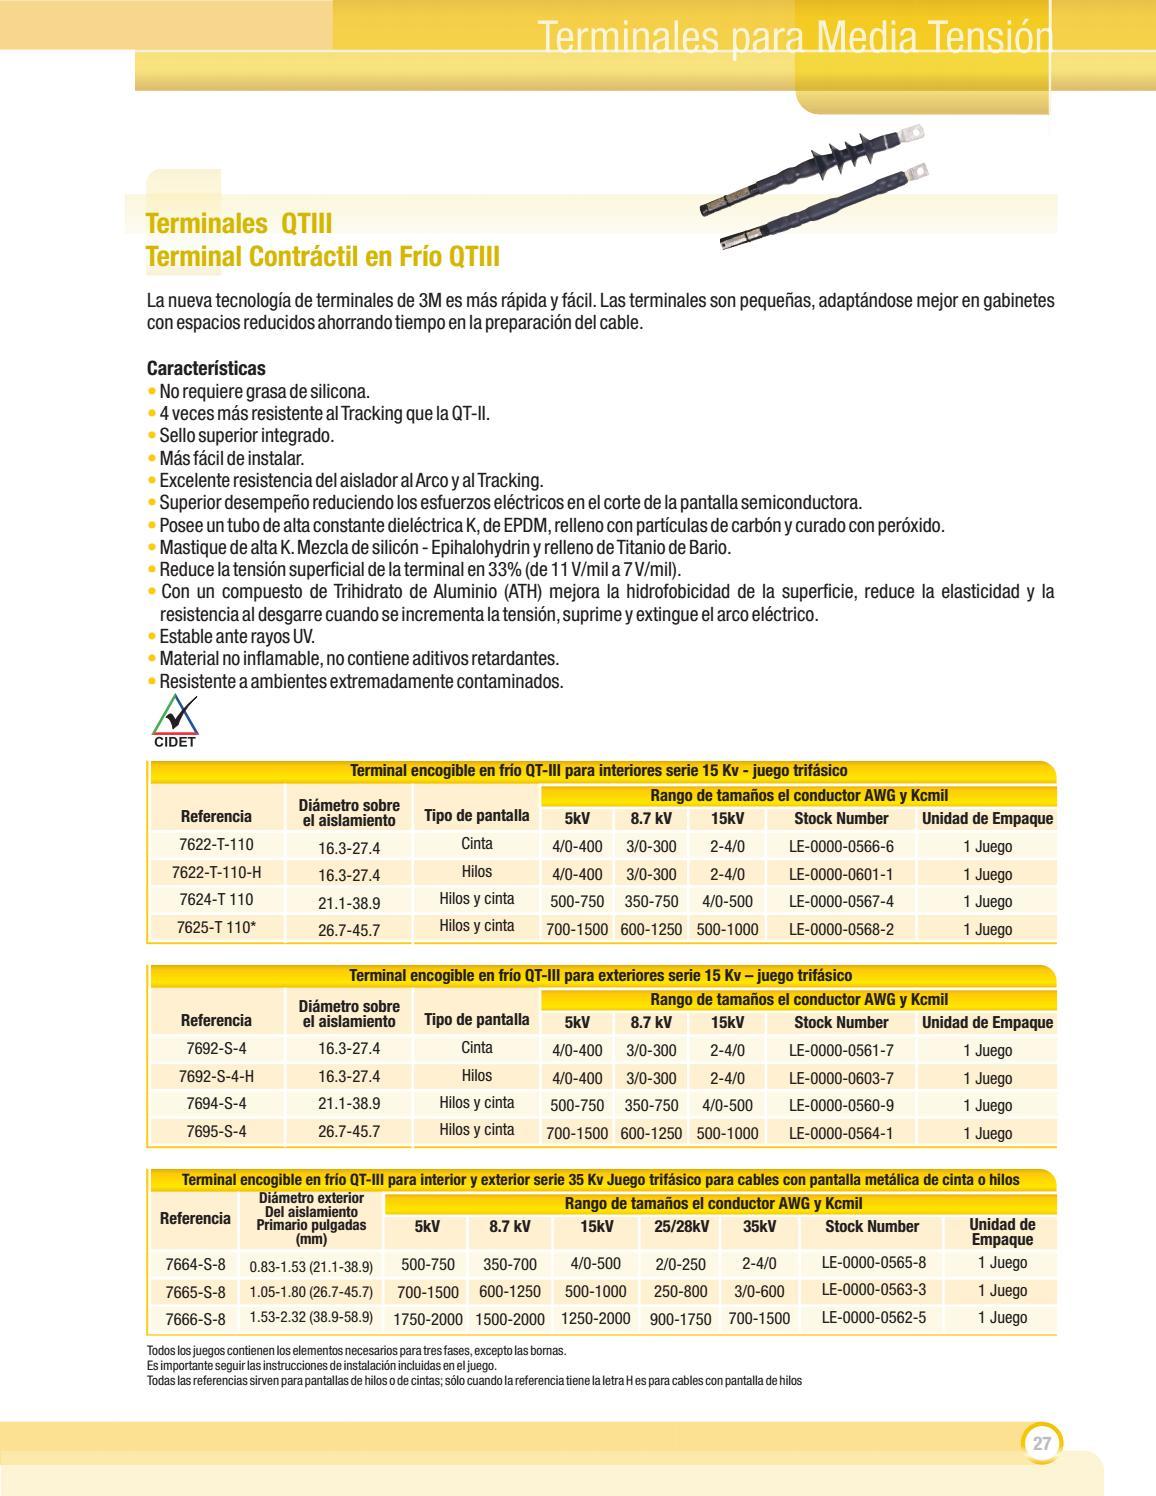 Hoja datos terminales qtii 15kv by juan pablo issuu for Terminal exterior 15 kv